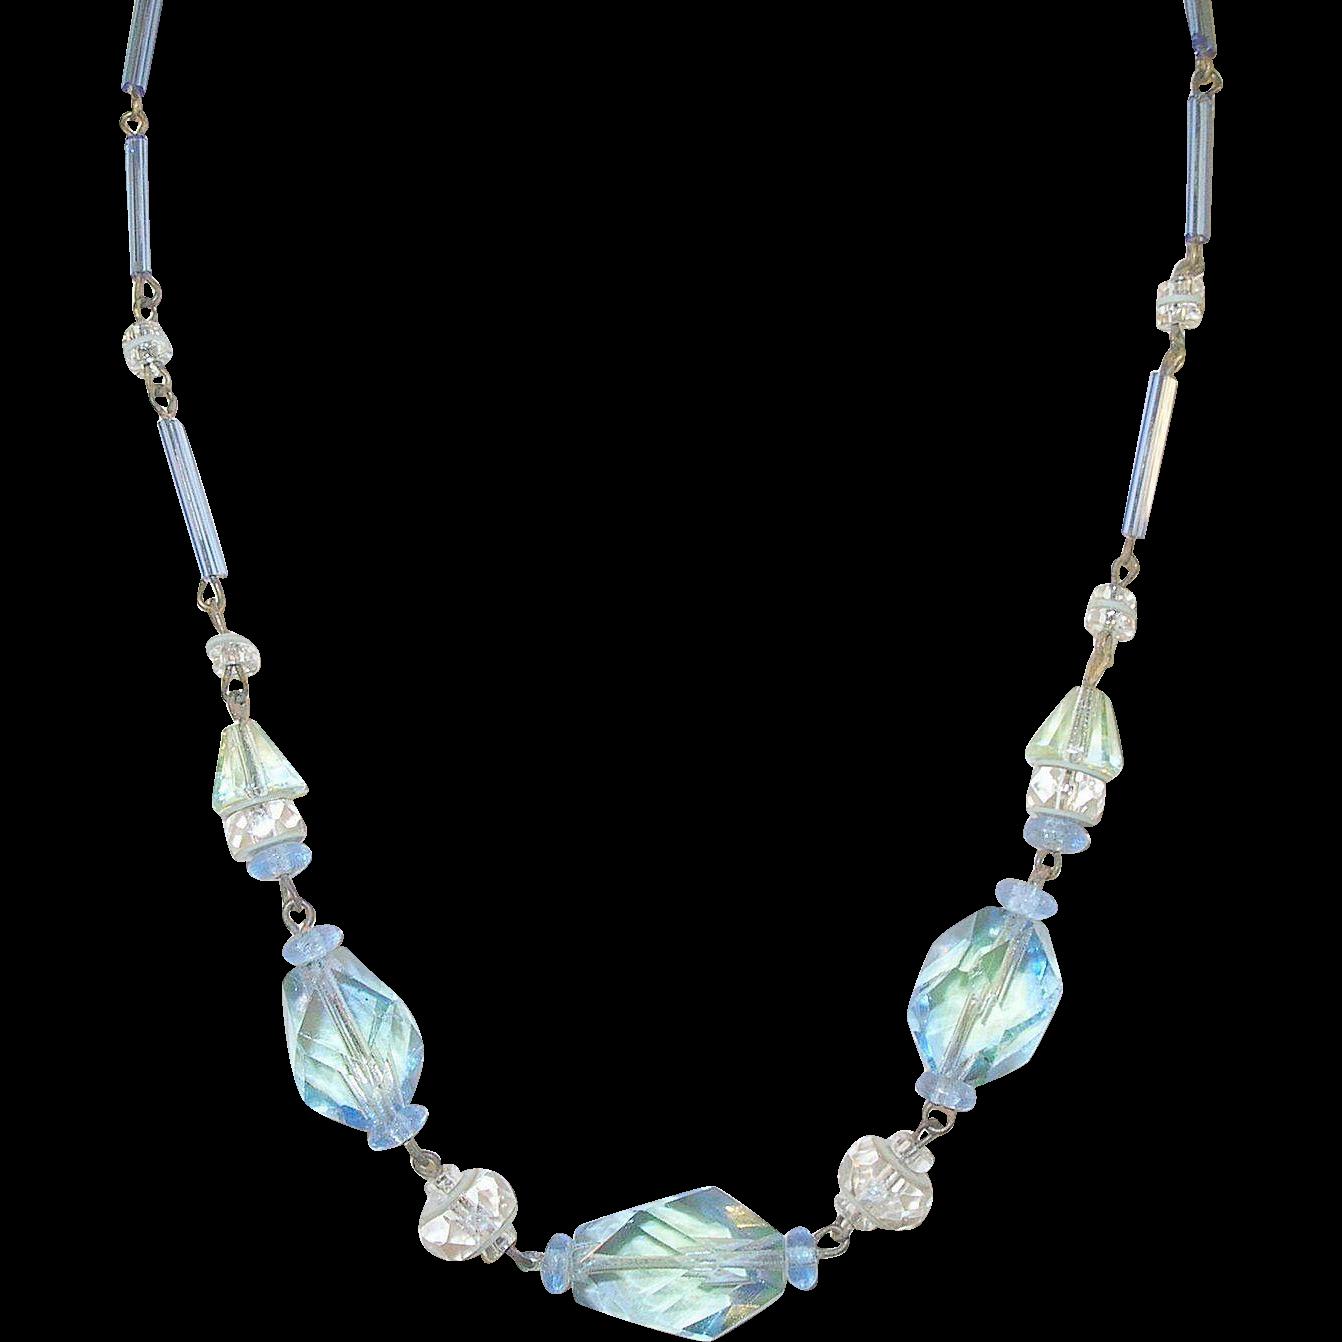 Vintage Bead Necklace 78